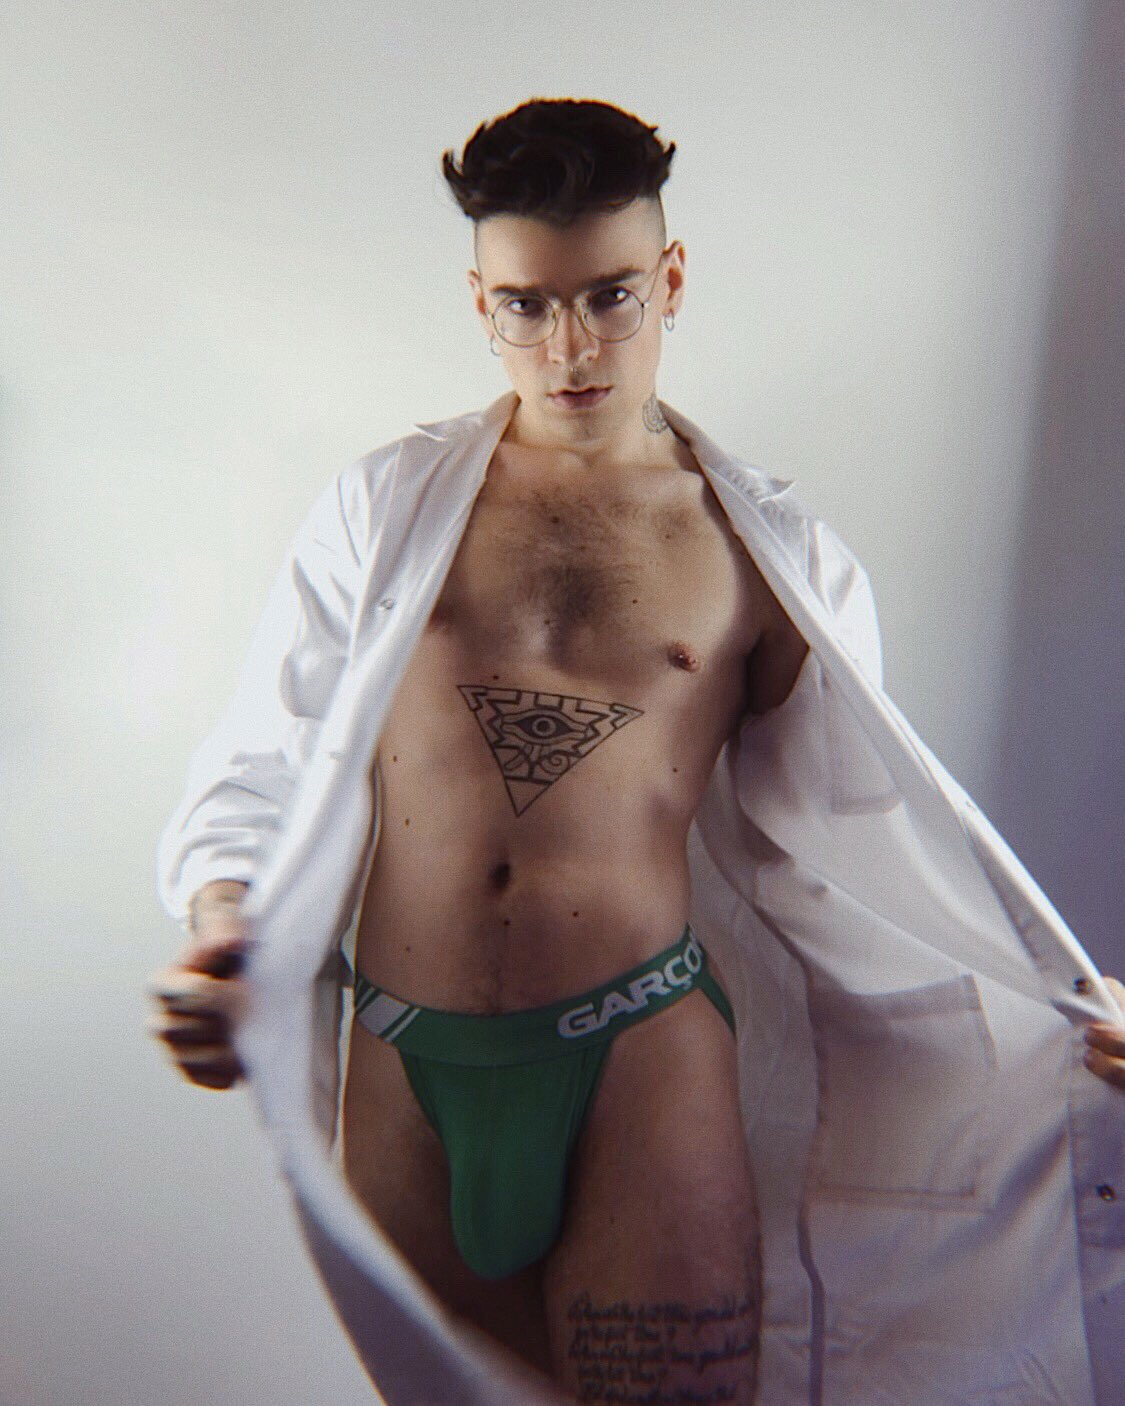 médico sin ropa